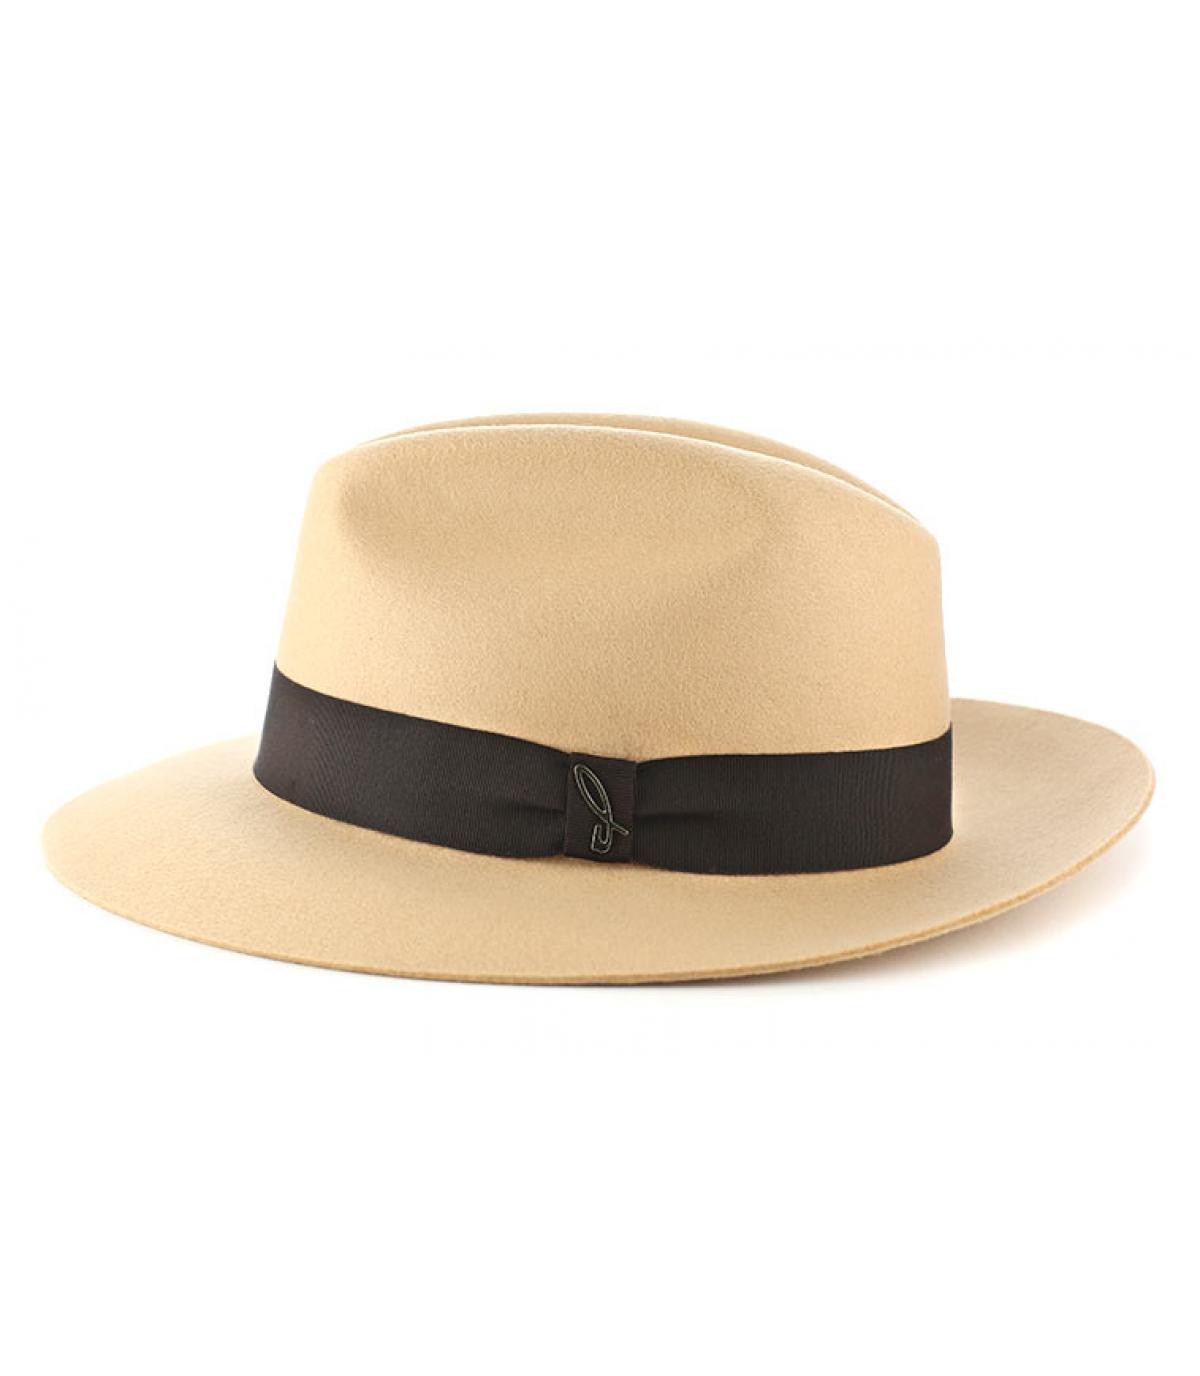 Chapeau feutre Doria beige